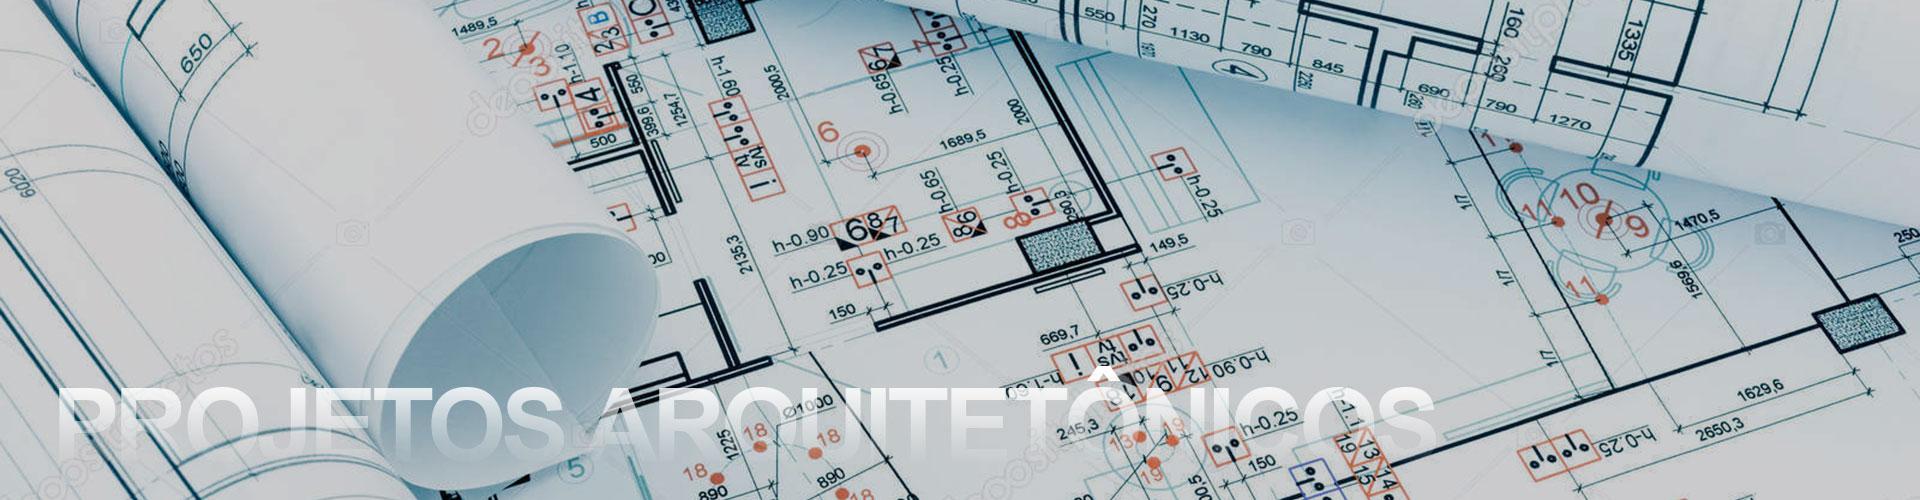 top-projetos-arquitetonicos